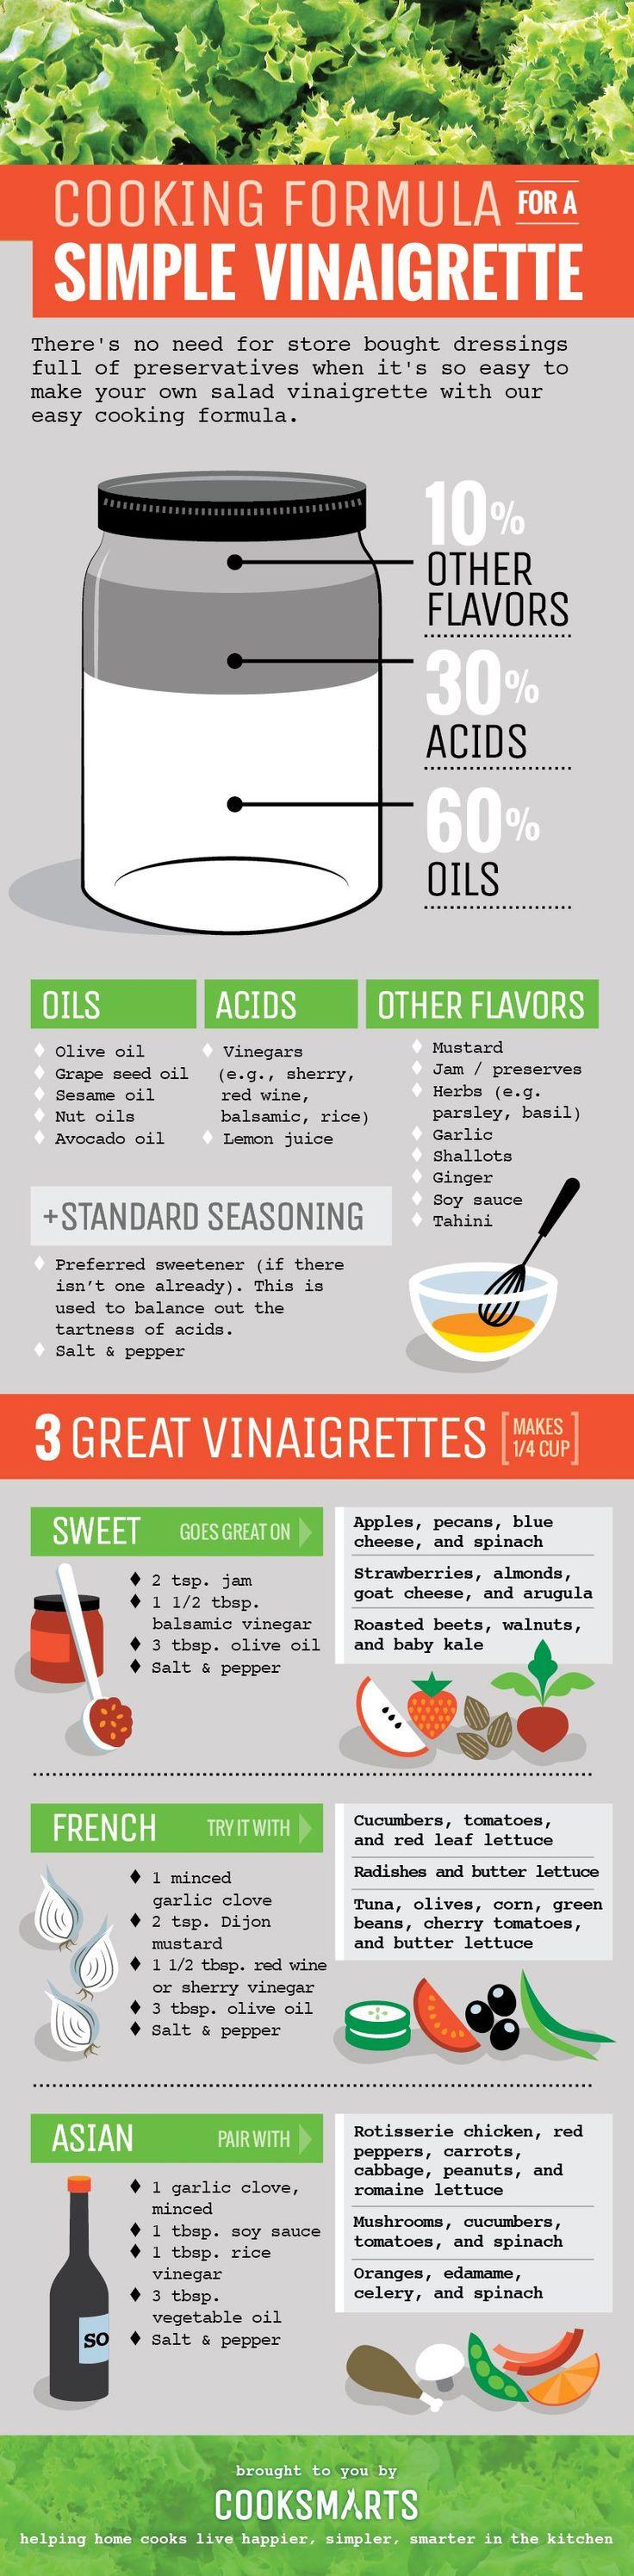 Cooking Formulas for Salad Vinaigrettes via @Kristin Plucker Plucker Plucker Plucker Plucker Plucker Plucker Plucker Yager Cook Smarts #infographic